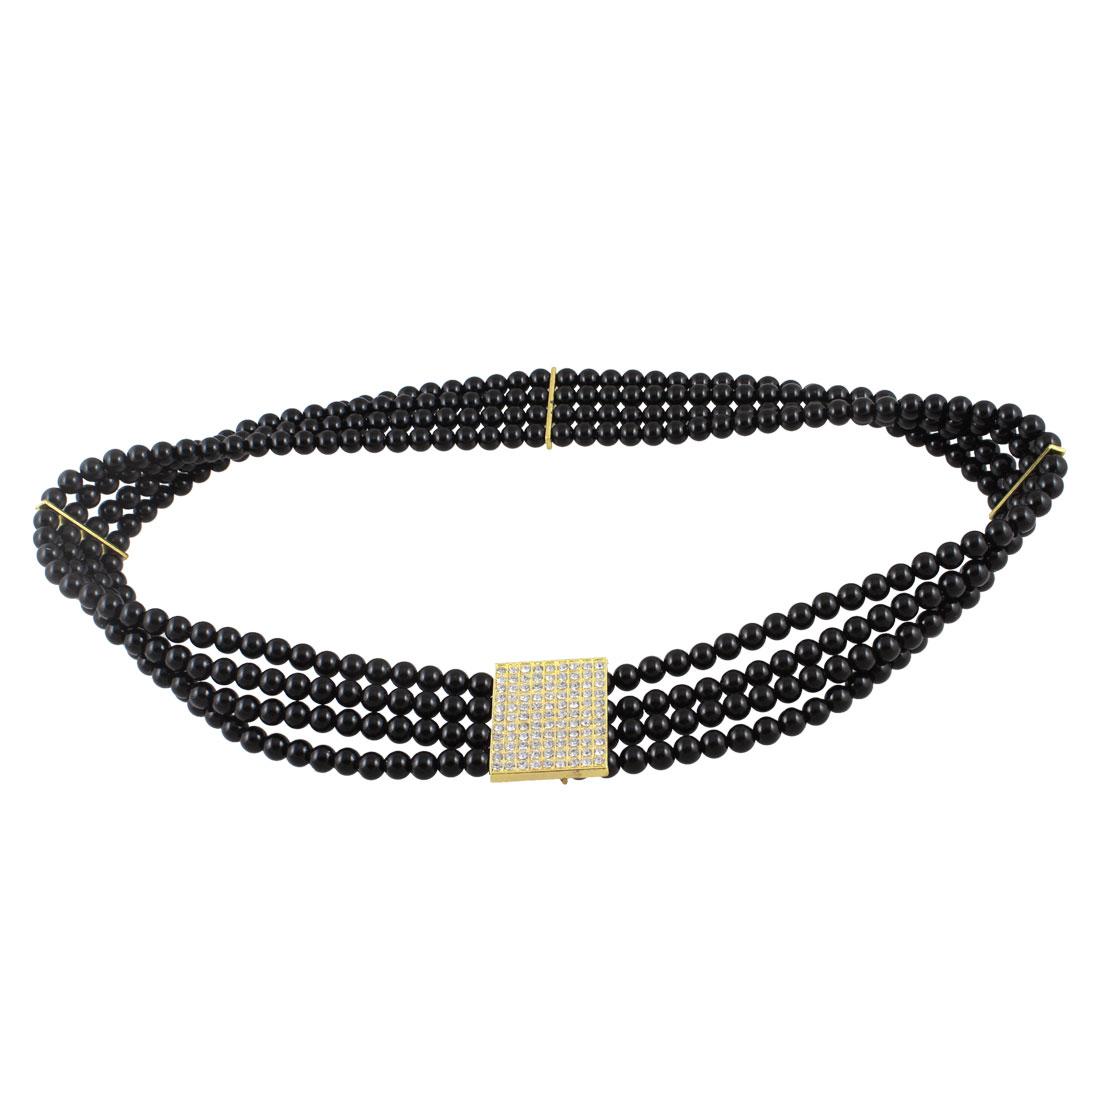 Woman Interlocking Buckle Rhinestone Beads Detail Black Waist Hip Belt Waistband Cinch